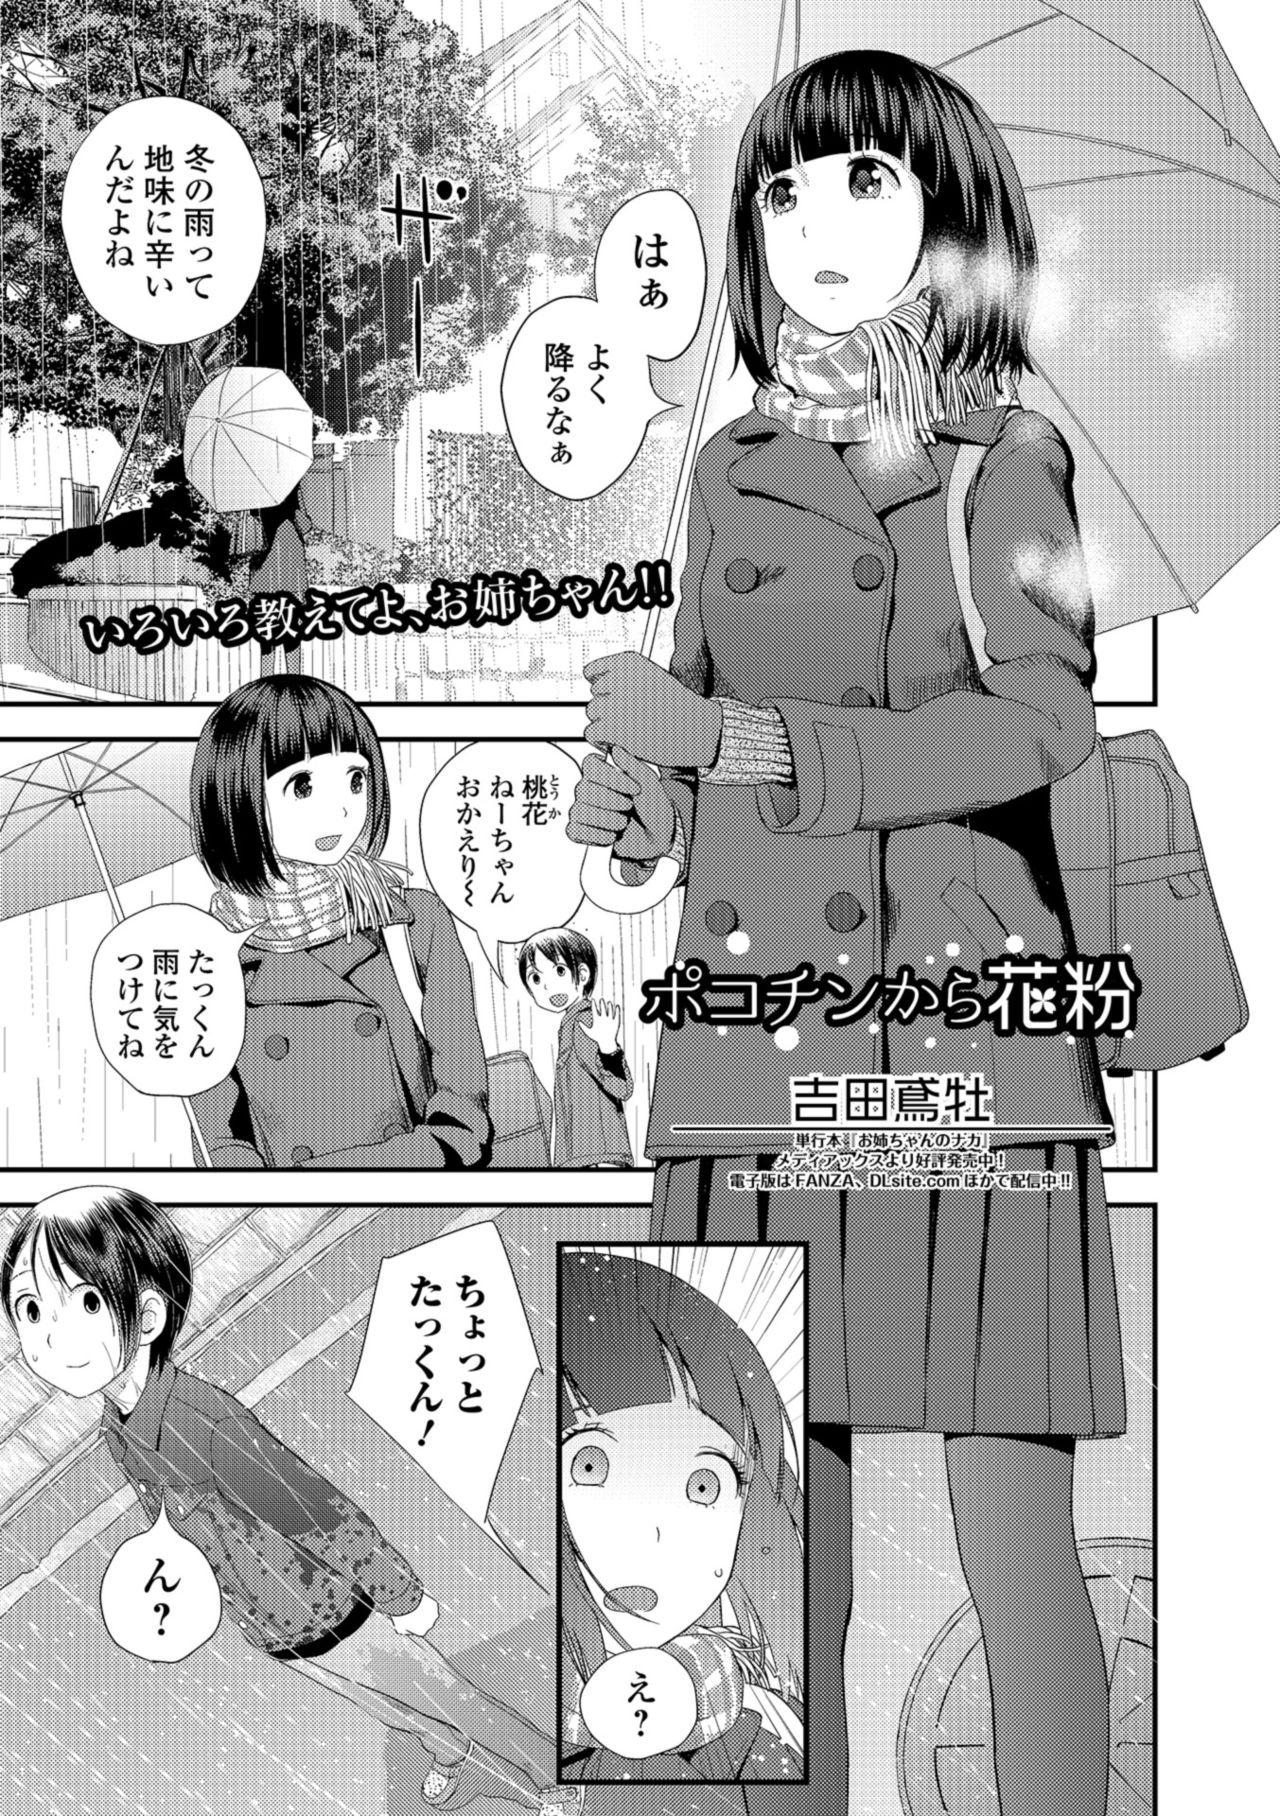 COMIC Shigekiteki SQUIRT!! Vol. 09 76